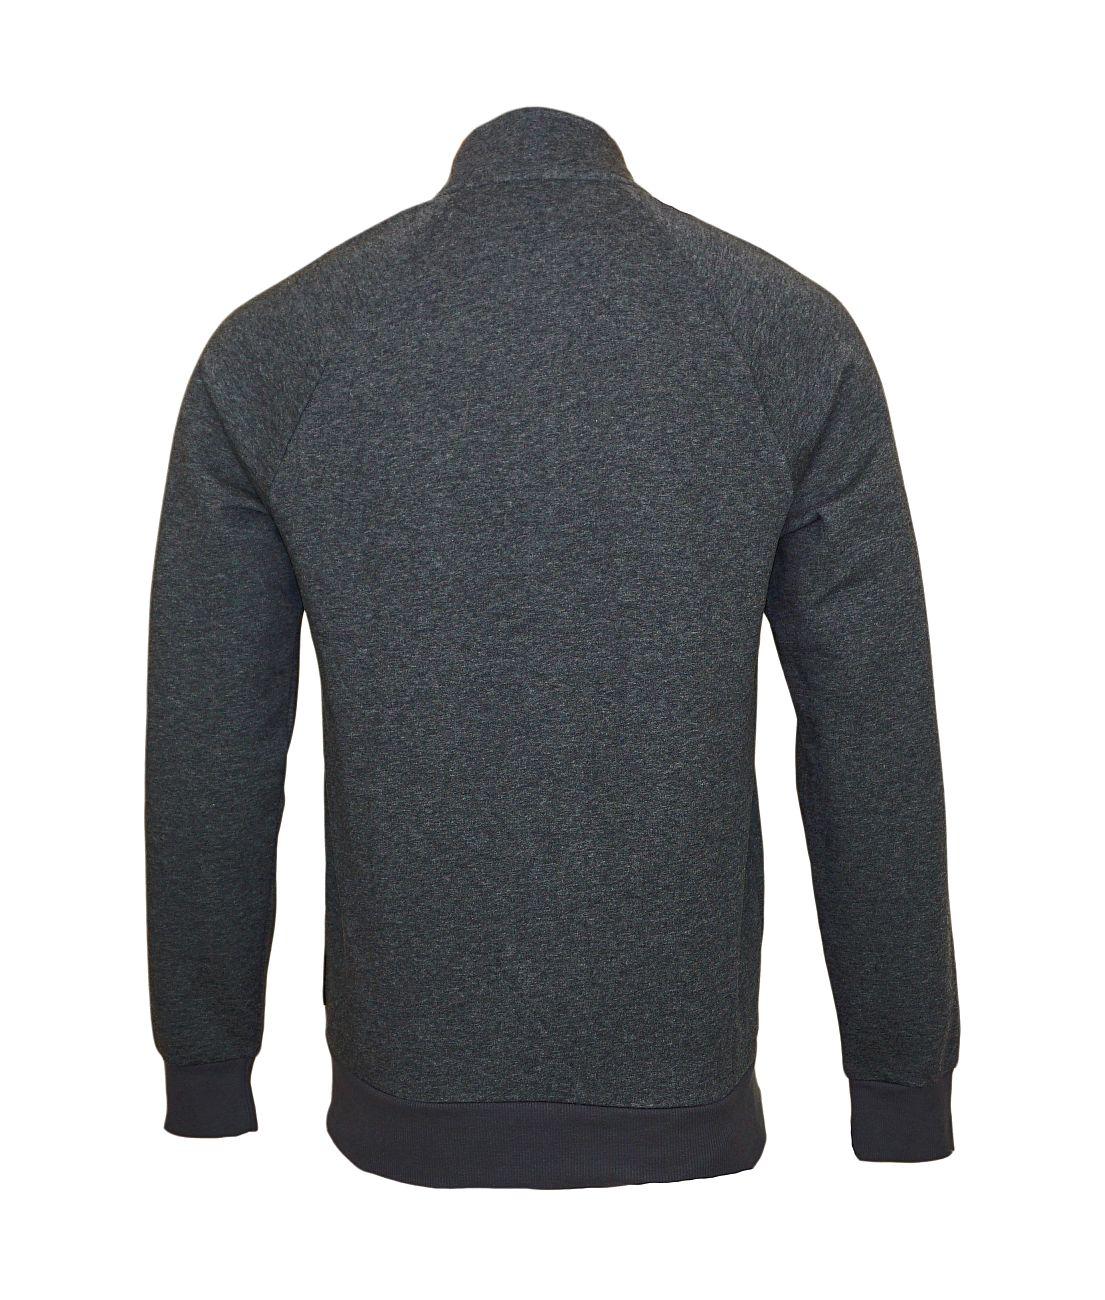 Emporio Armani Sweater Jacke mit Reißverschluss 111570 8A571 57720 GRIGIO MELANGE NERO SH18-EAS1